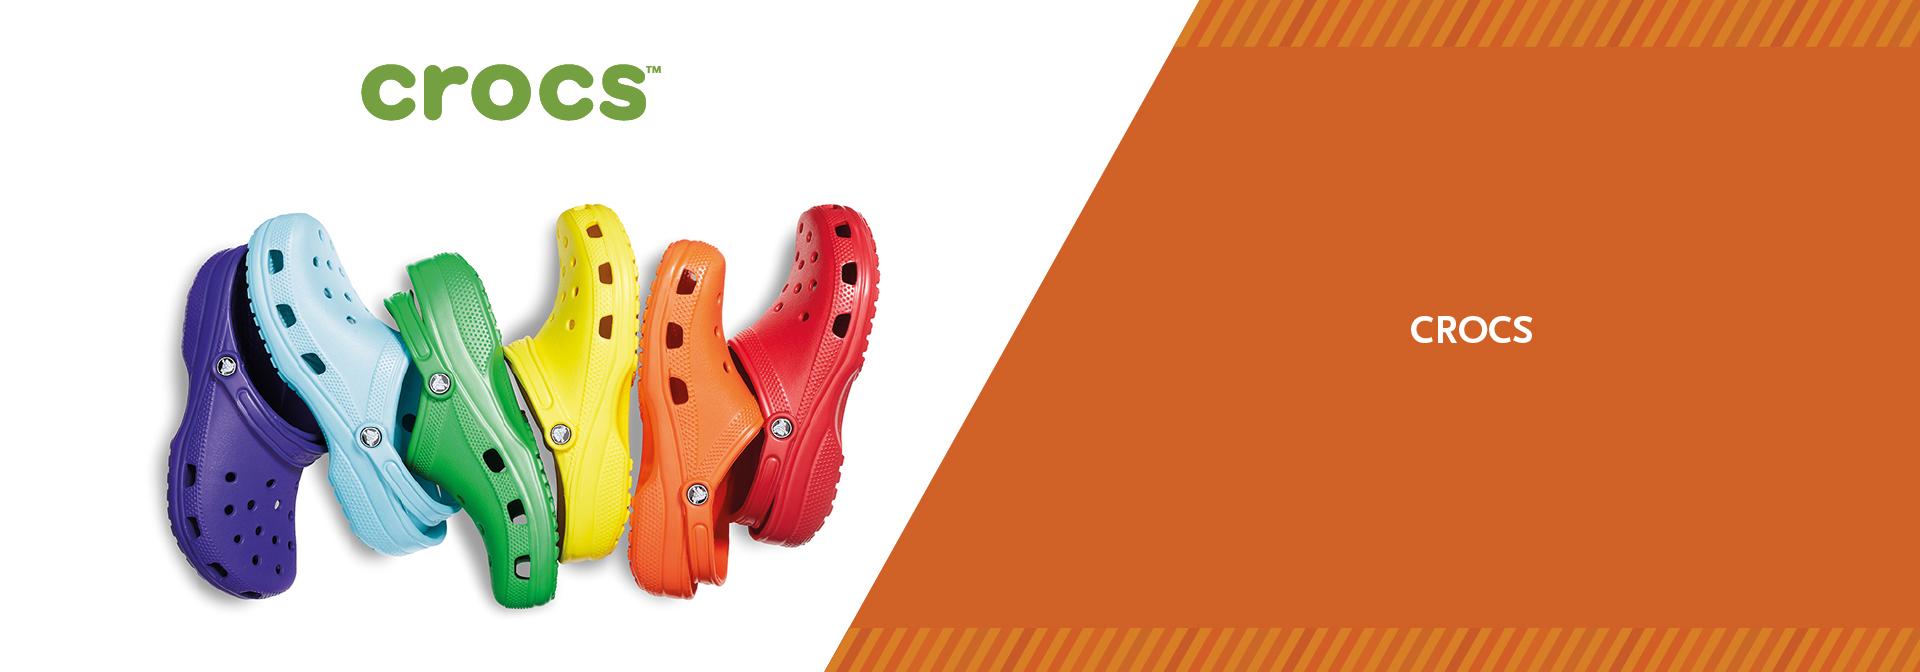 crocs-banner.jpg